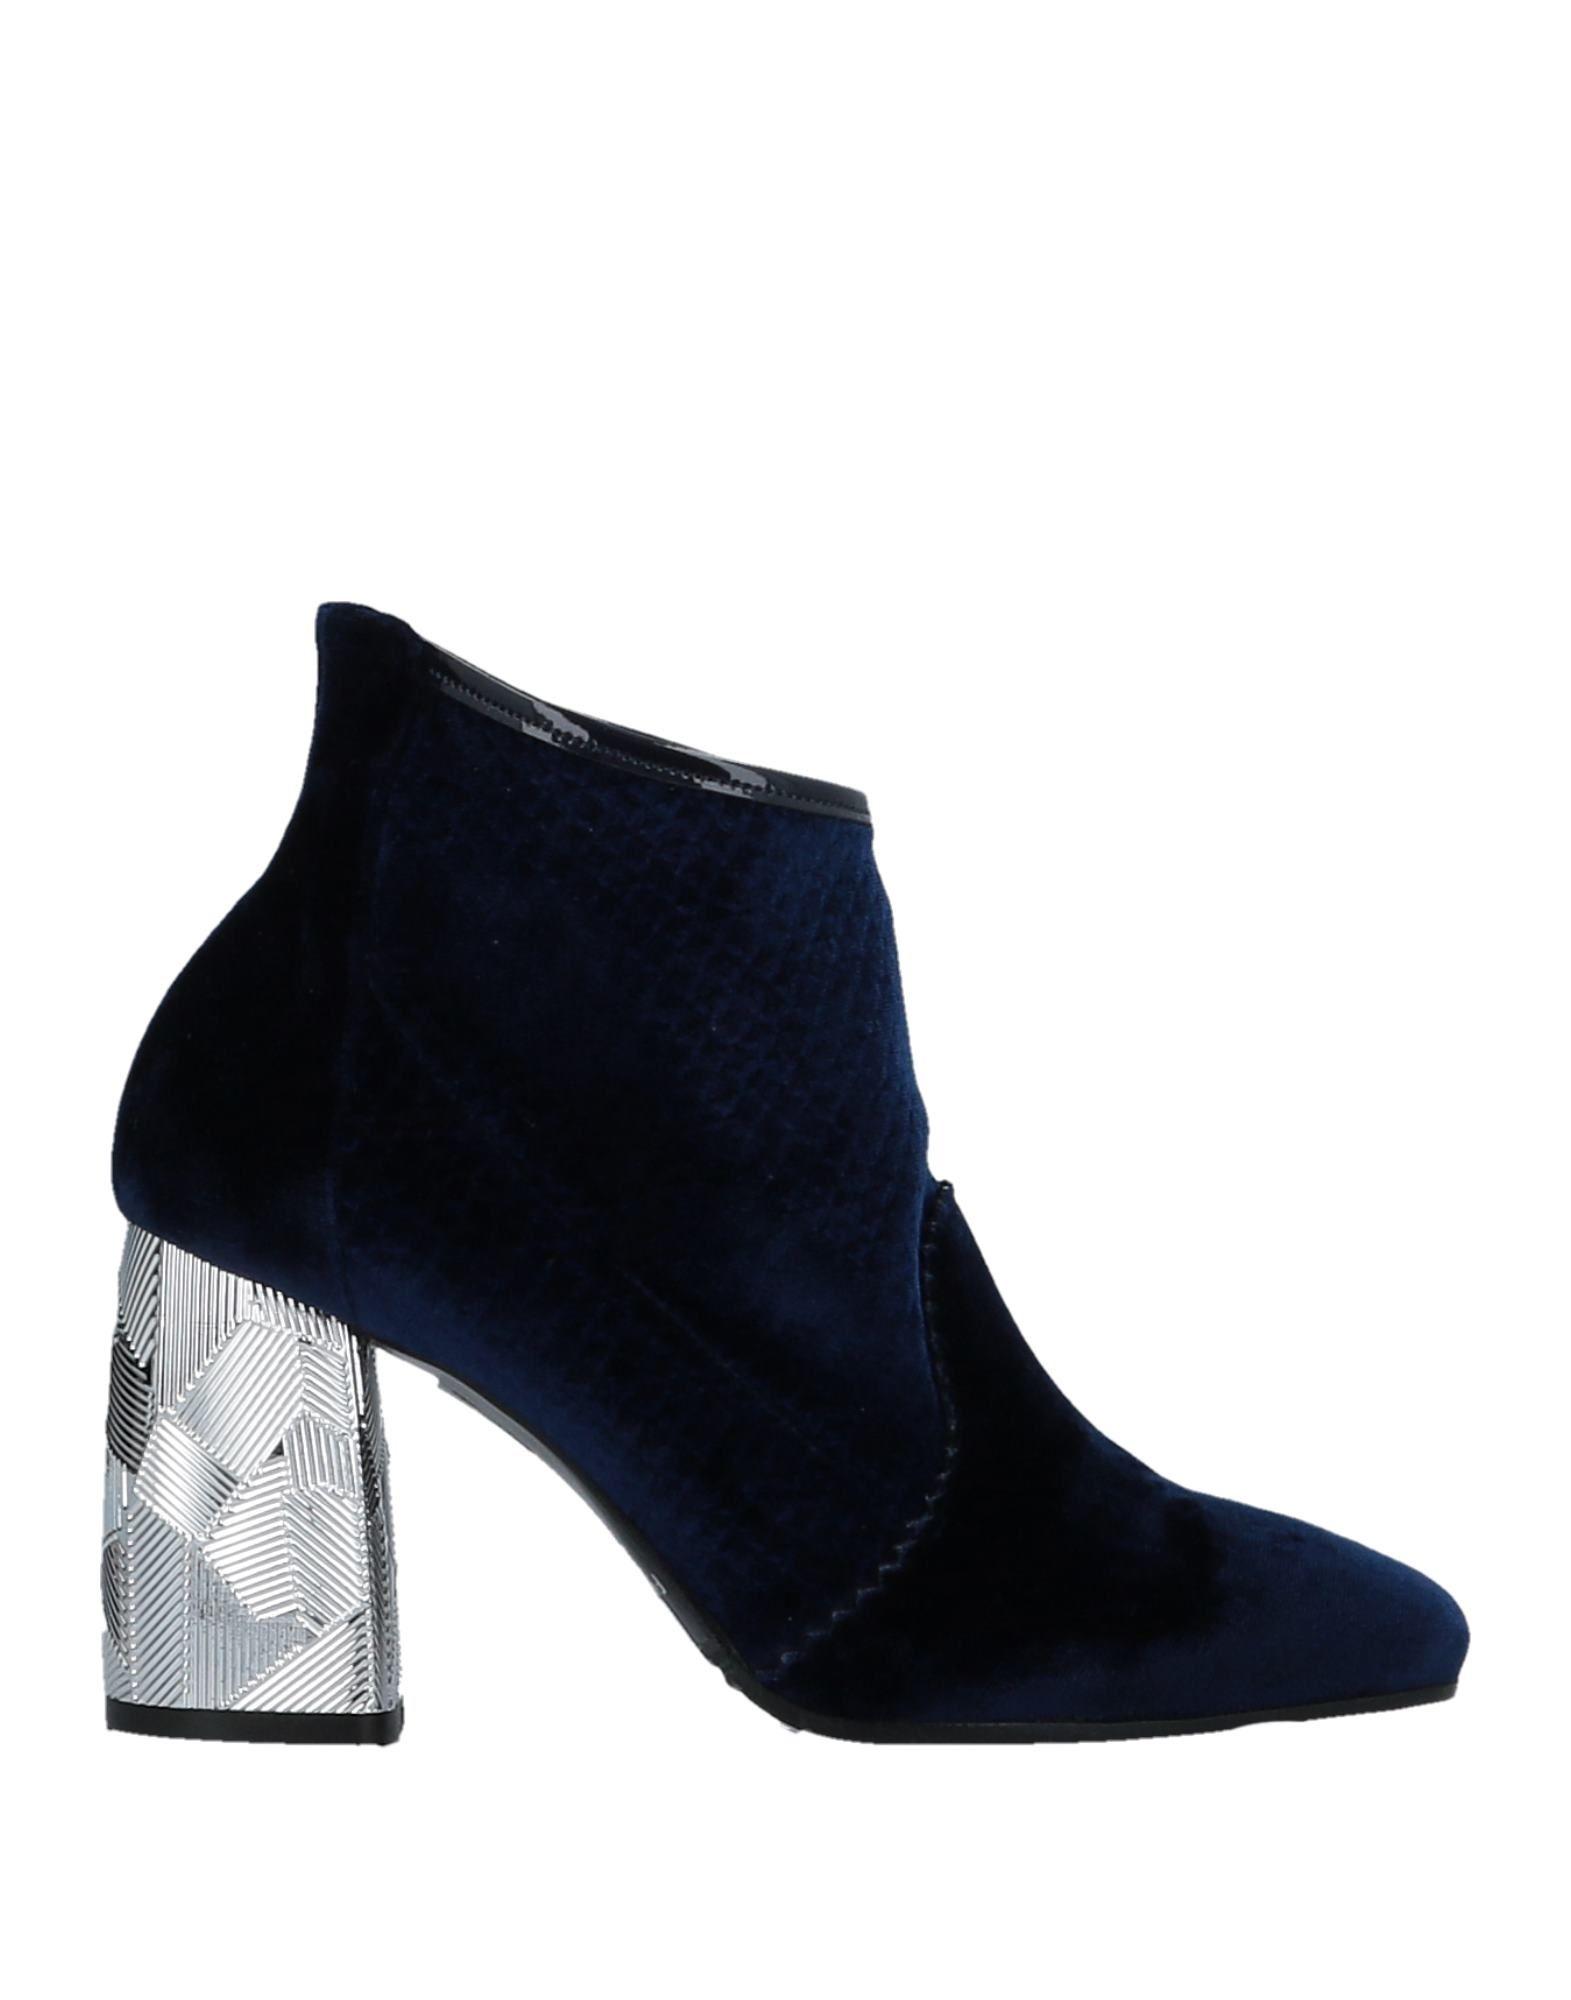 Moda Stivaletti Fiorangelo Donna - 11510729SH